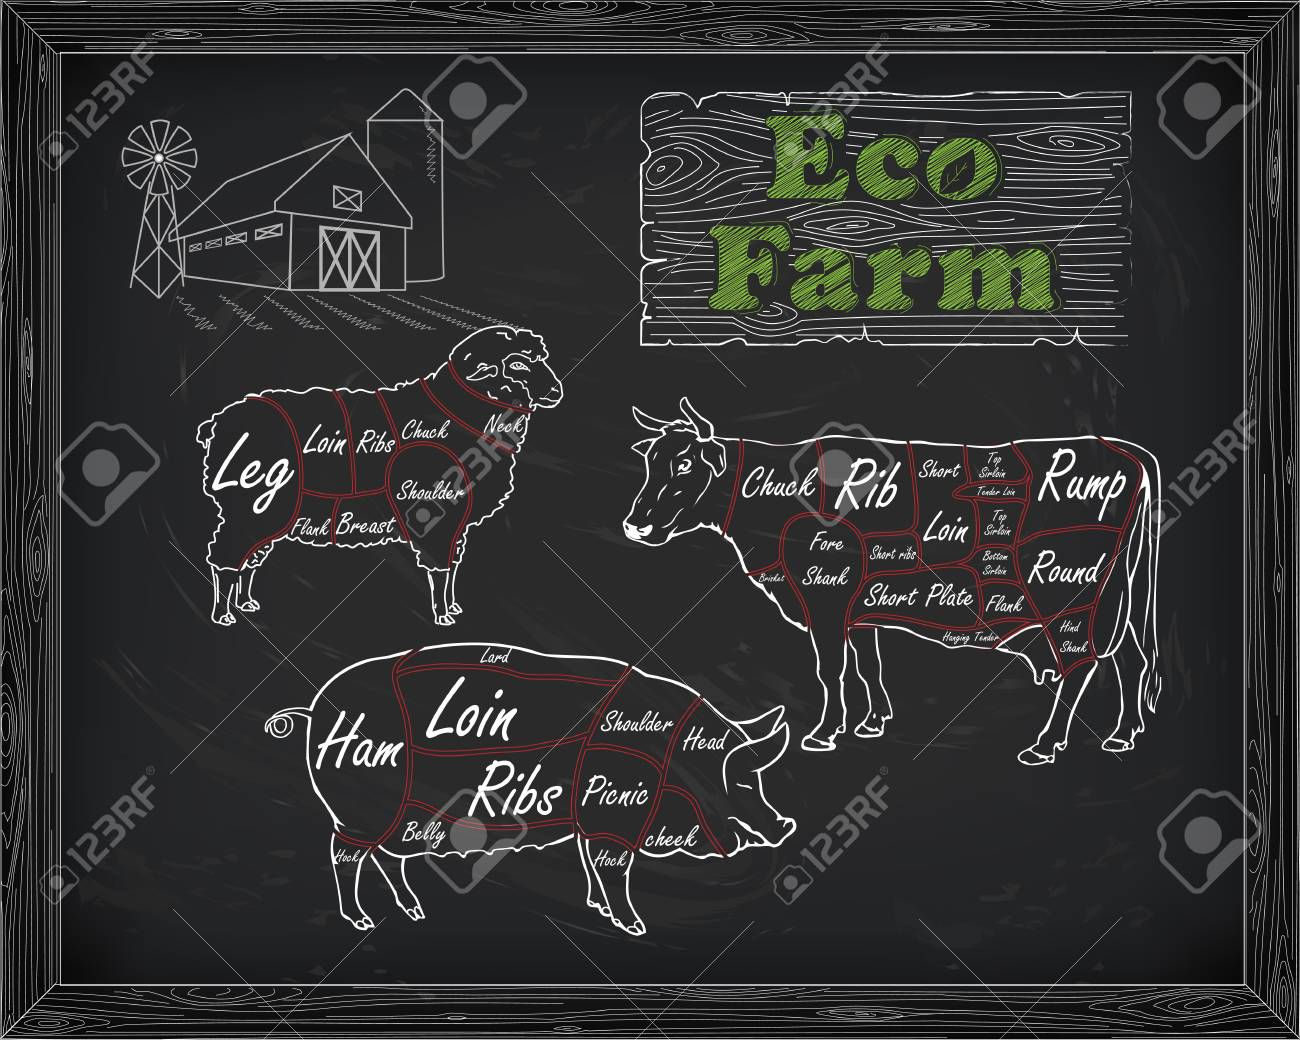 Butchering Beef Diagram Pork Lamb And Farm Drawn In Chalk Royalty Pig Butcher Stock Vector 54564027